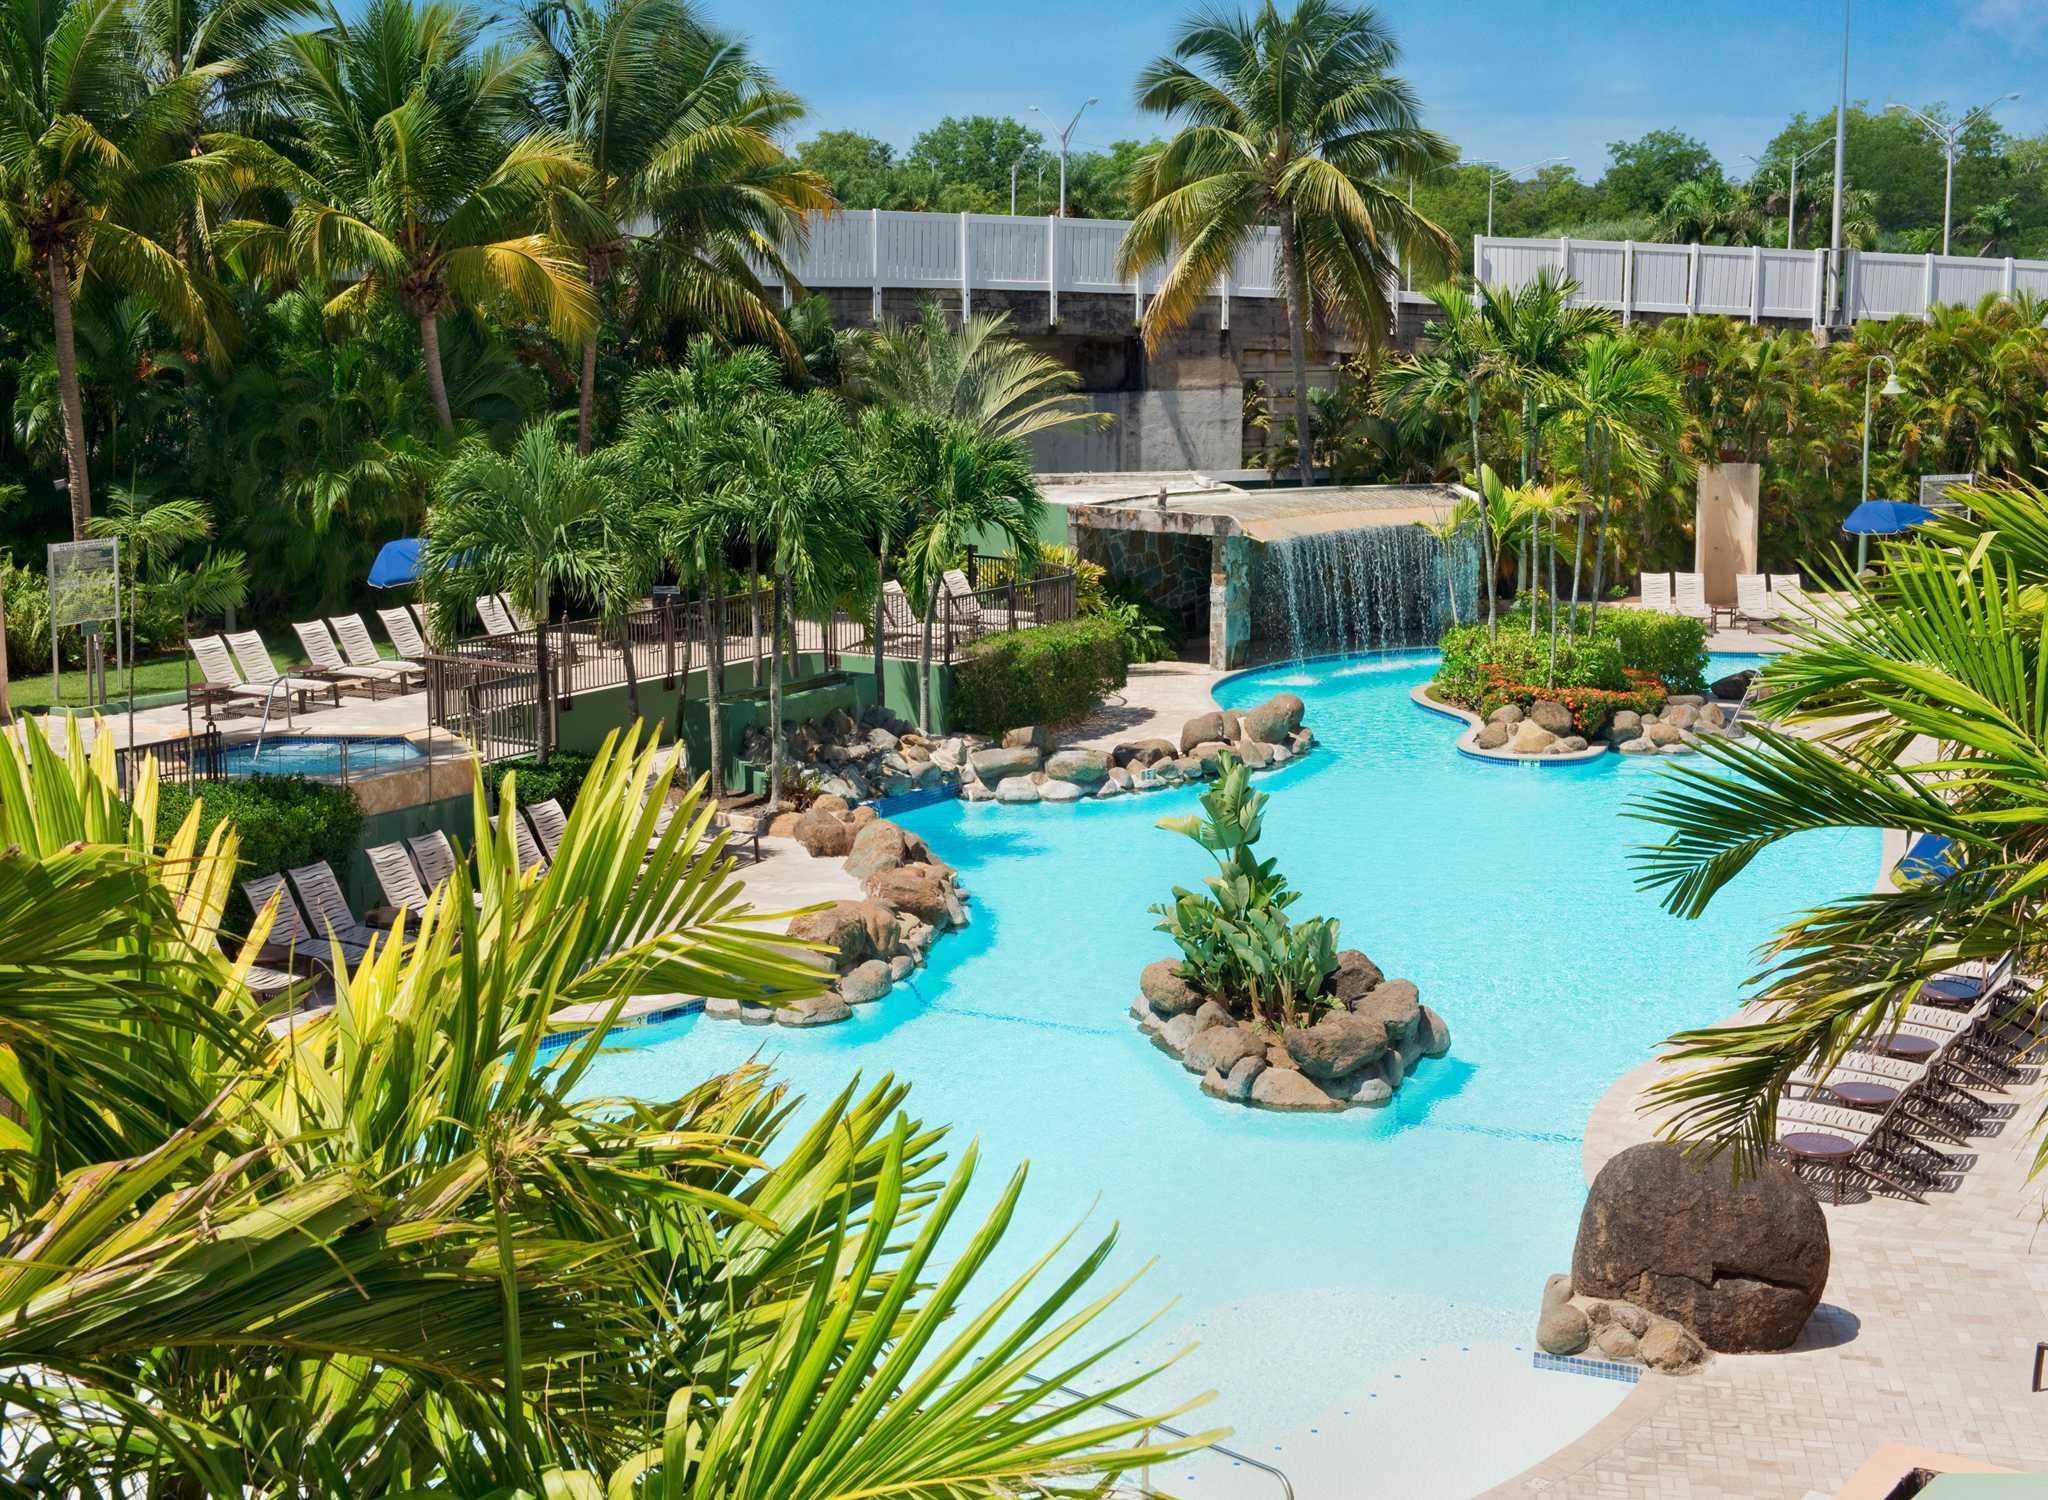 Hoteis e resorts em porto rico san juan hilton worldwide for Piscinas san juan pamplona